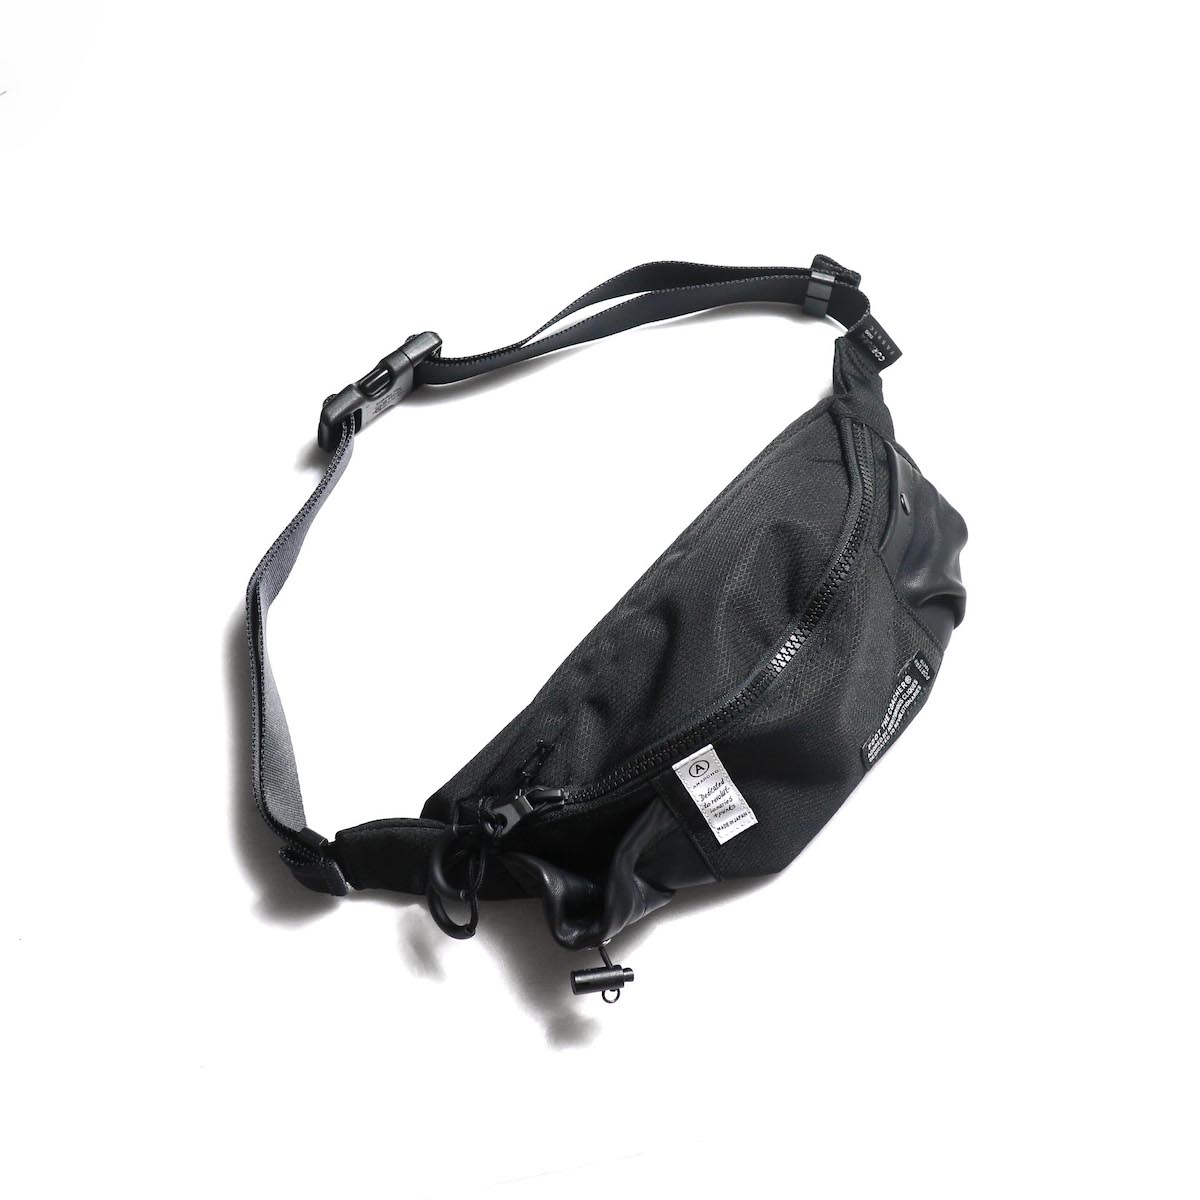 foot the coacher × PORTER / ANARCHO WAIST BAG (Black Ripstop)